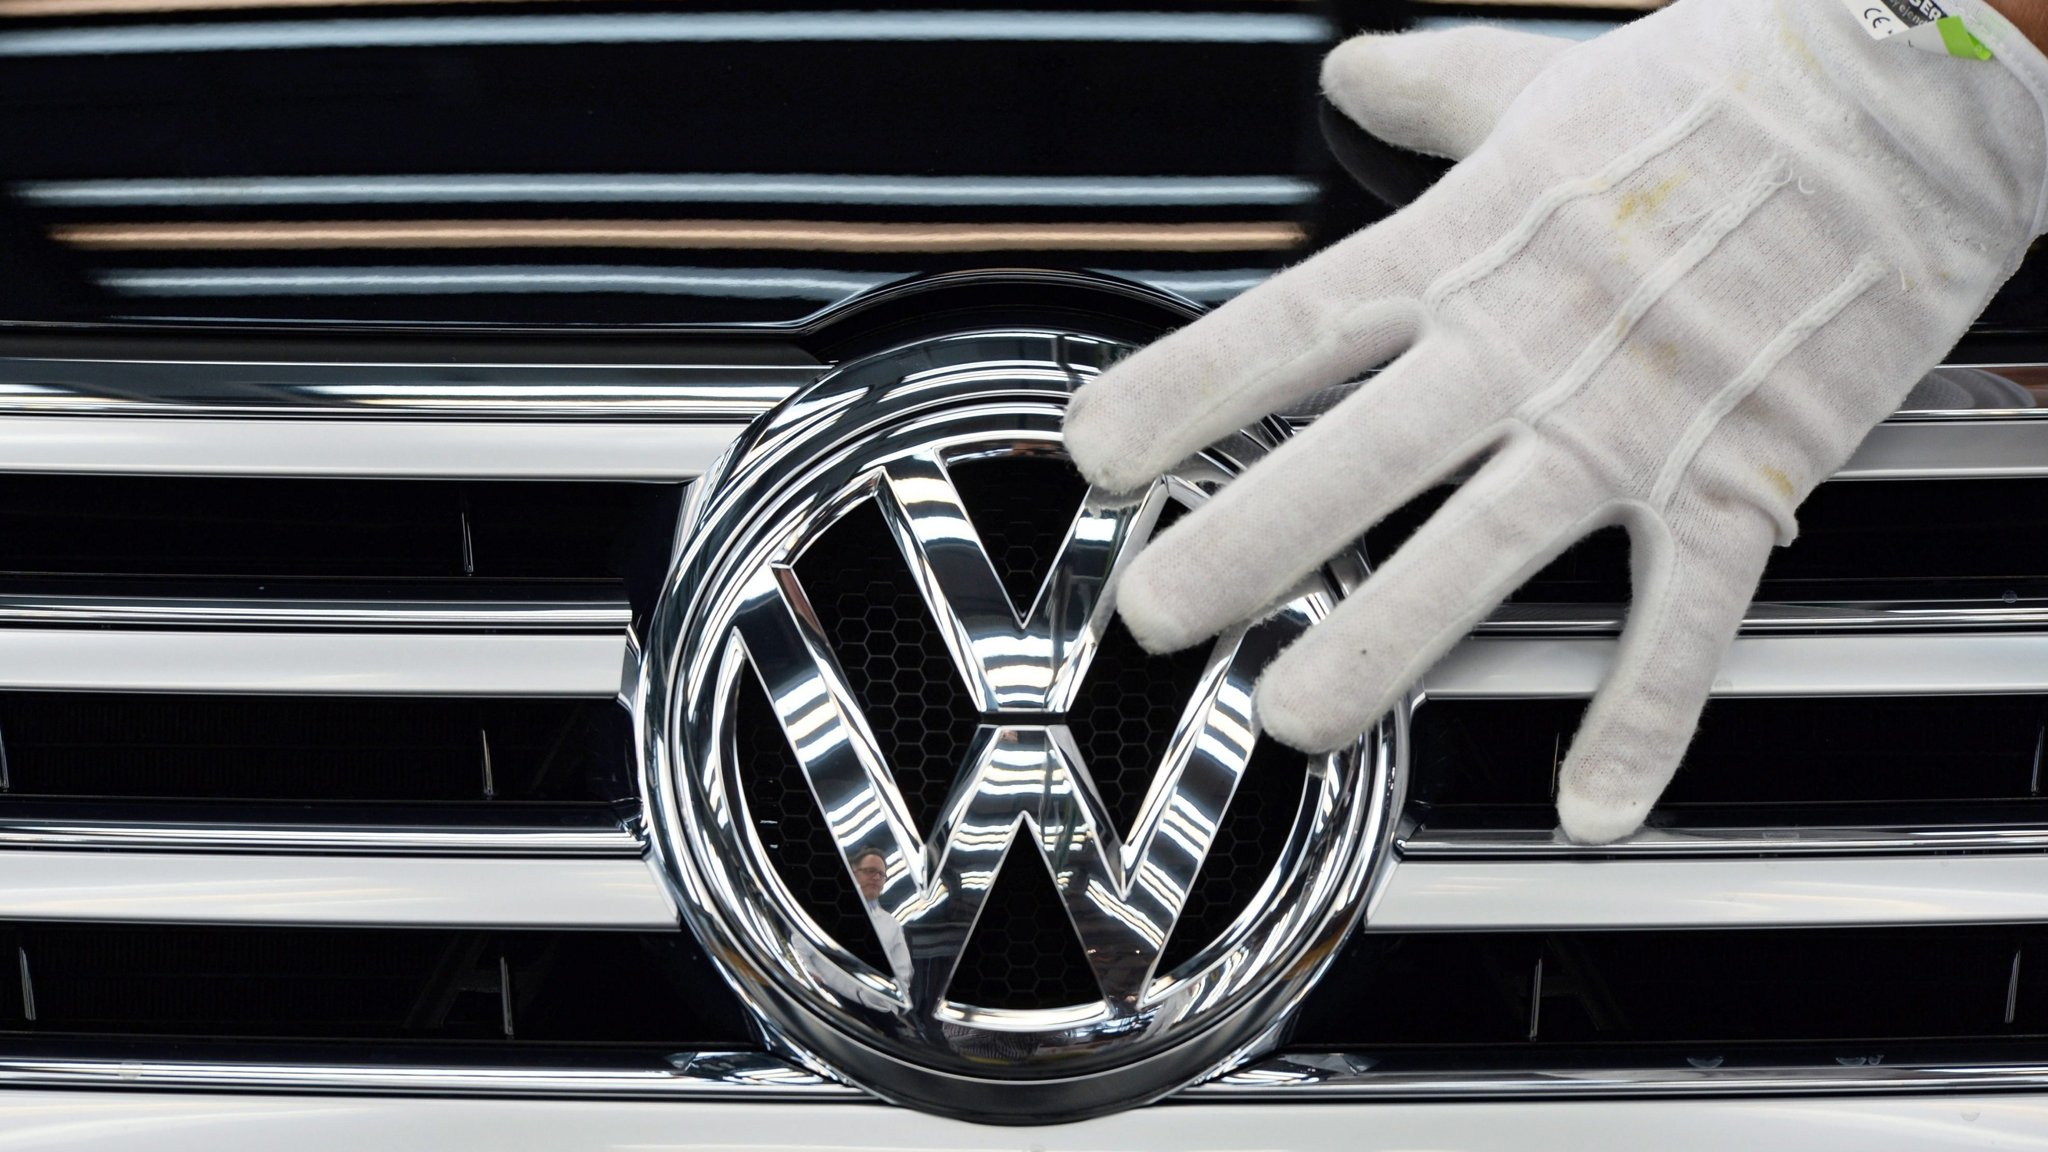 Governance remains scandal-hit VW's Achilles heel